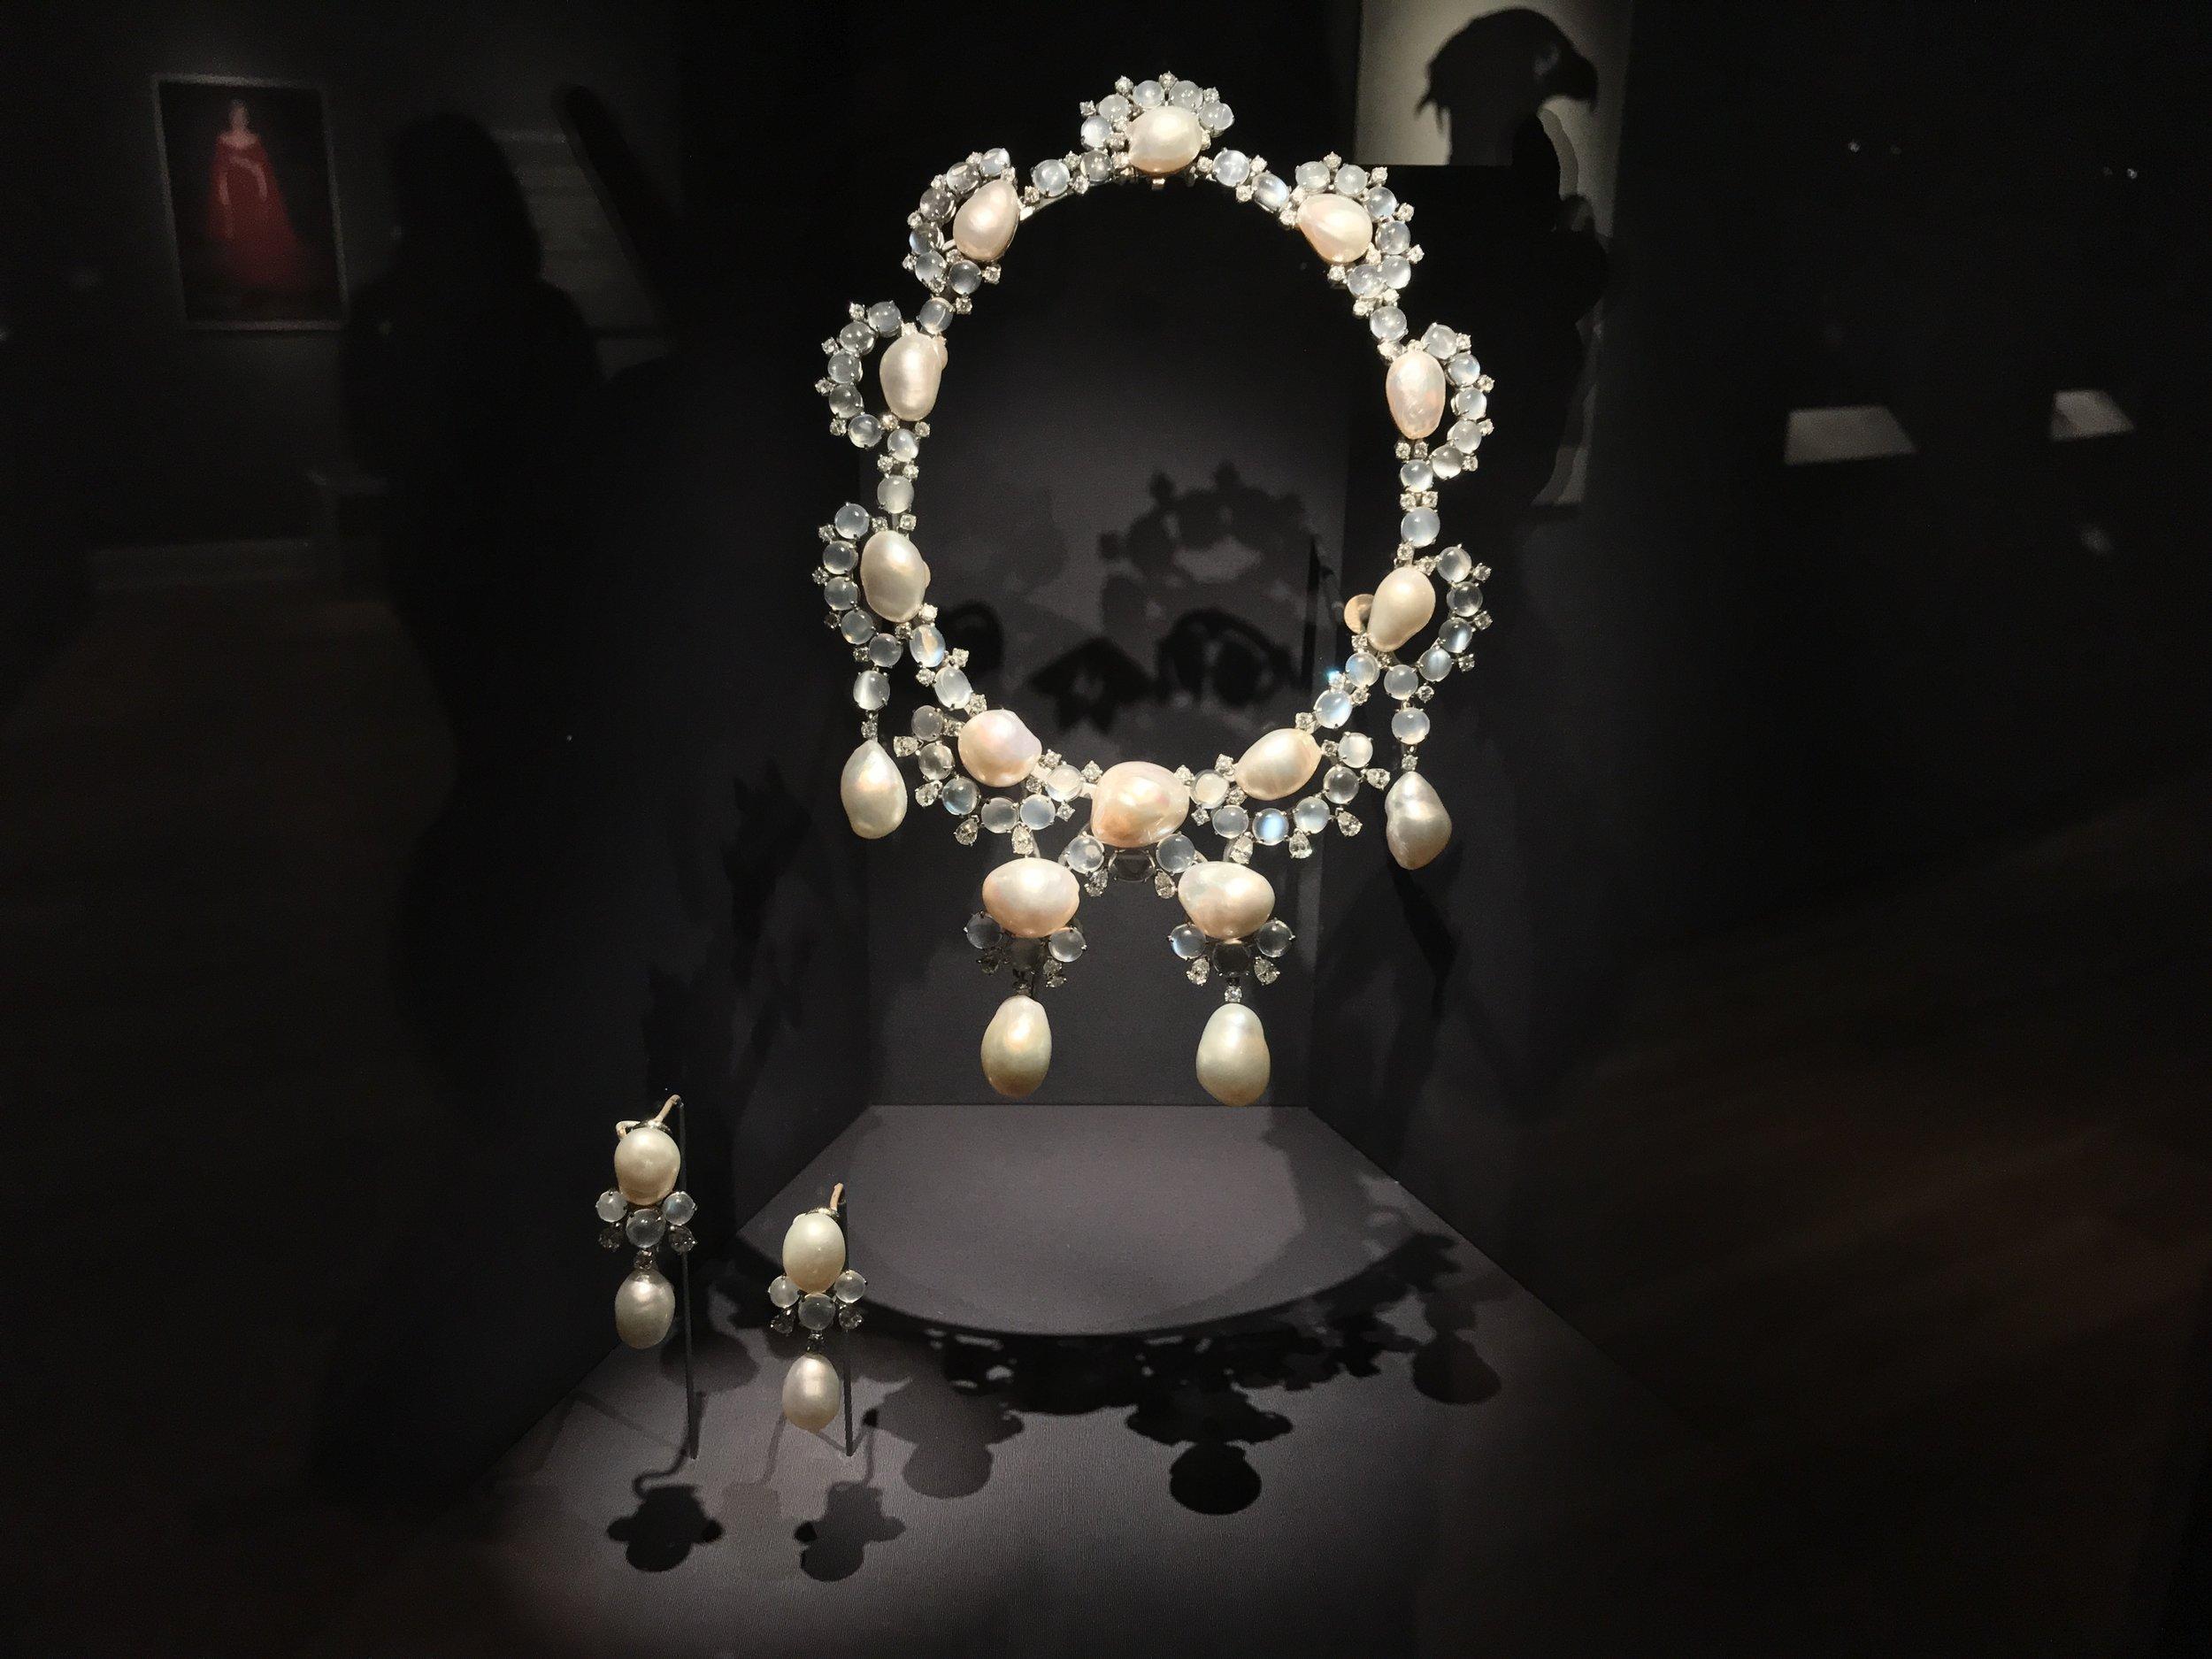 Burmese pearls, diamonds and moonstones